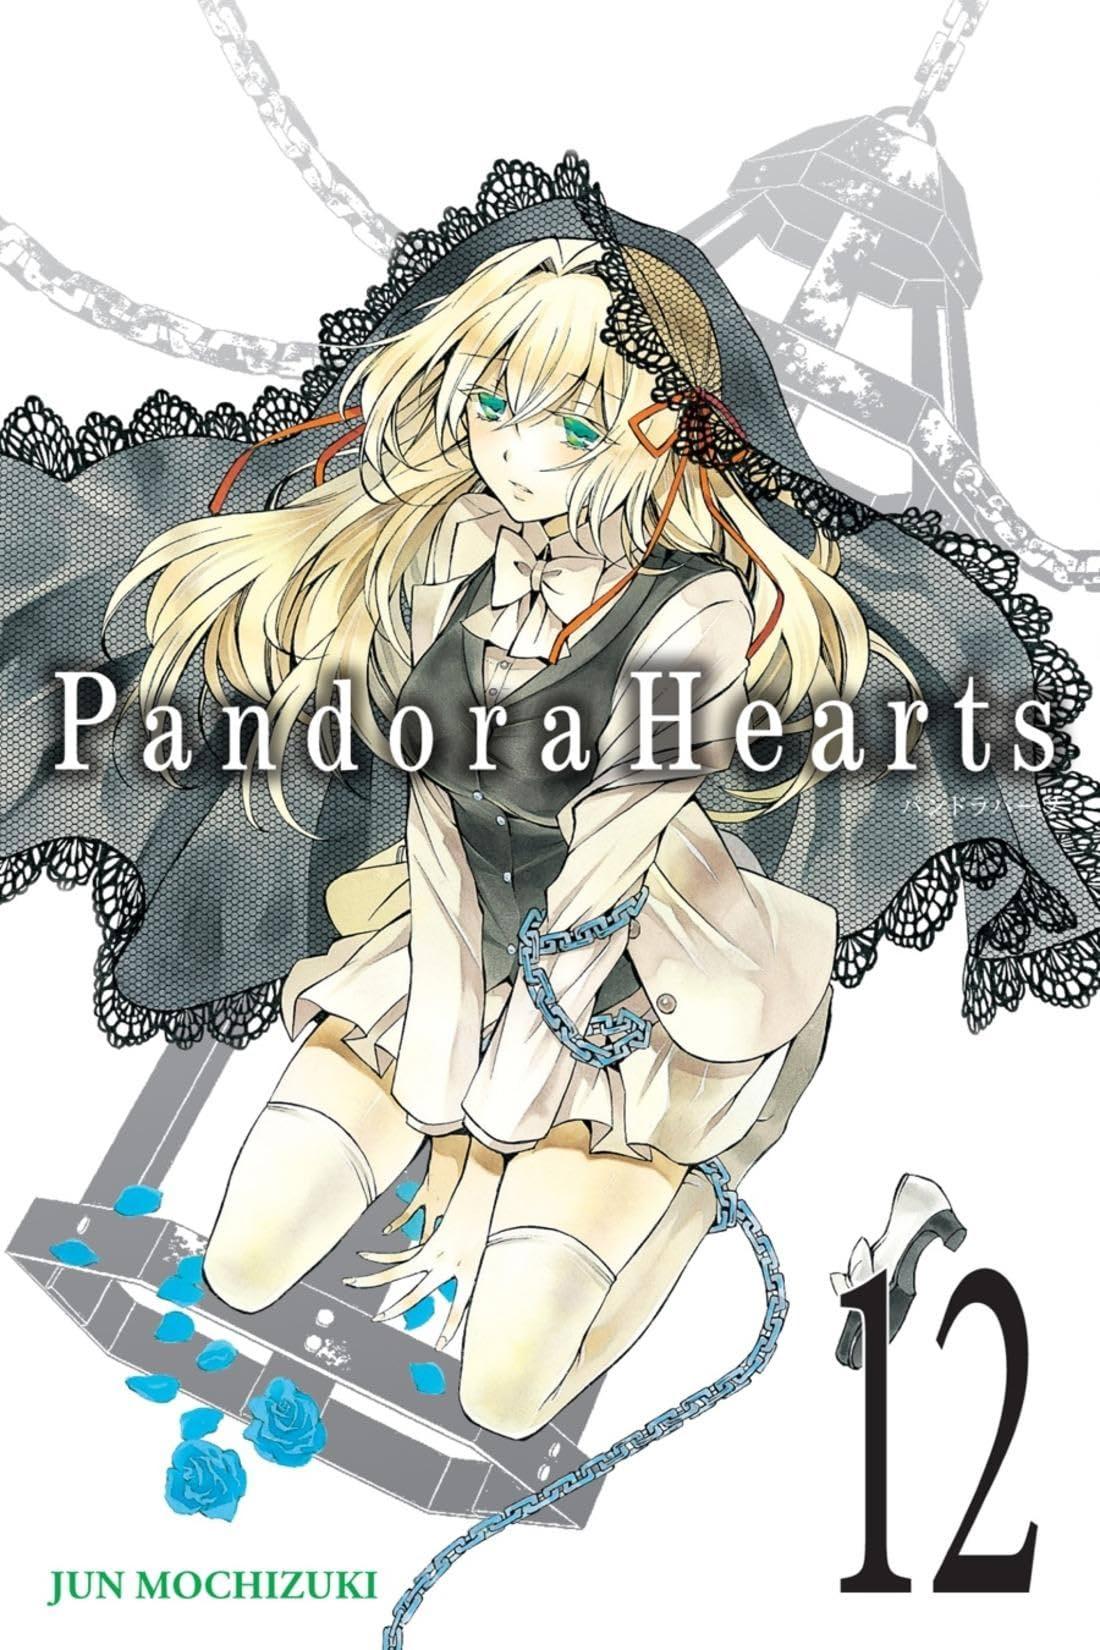 PandoraHearts Vol. 12